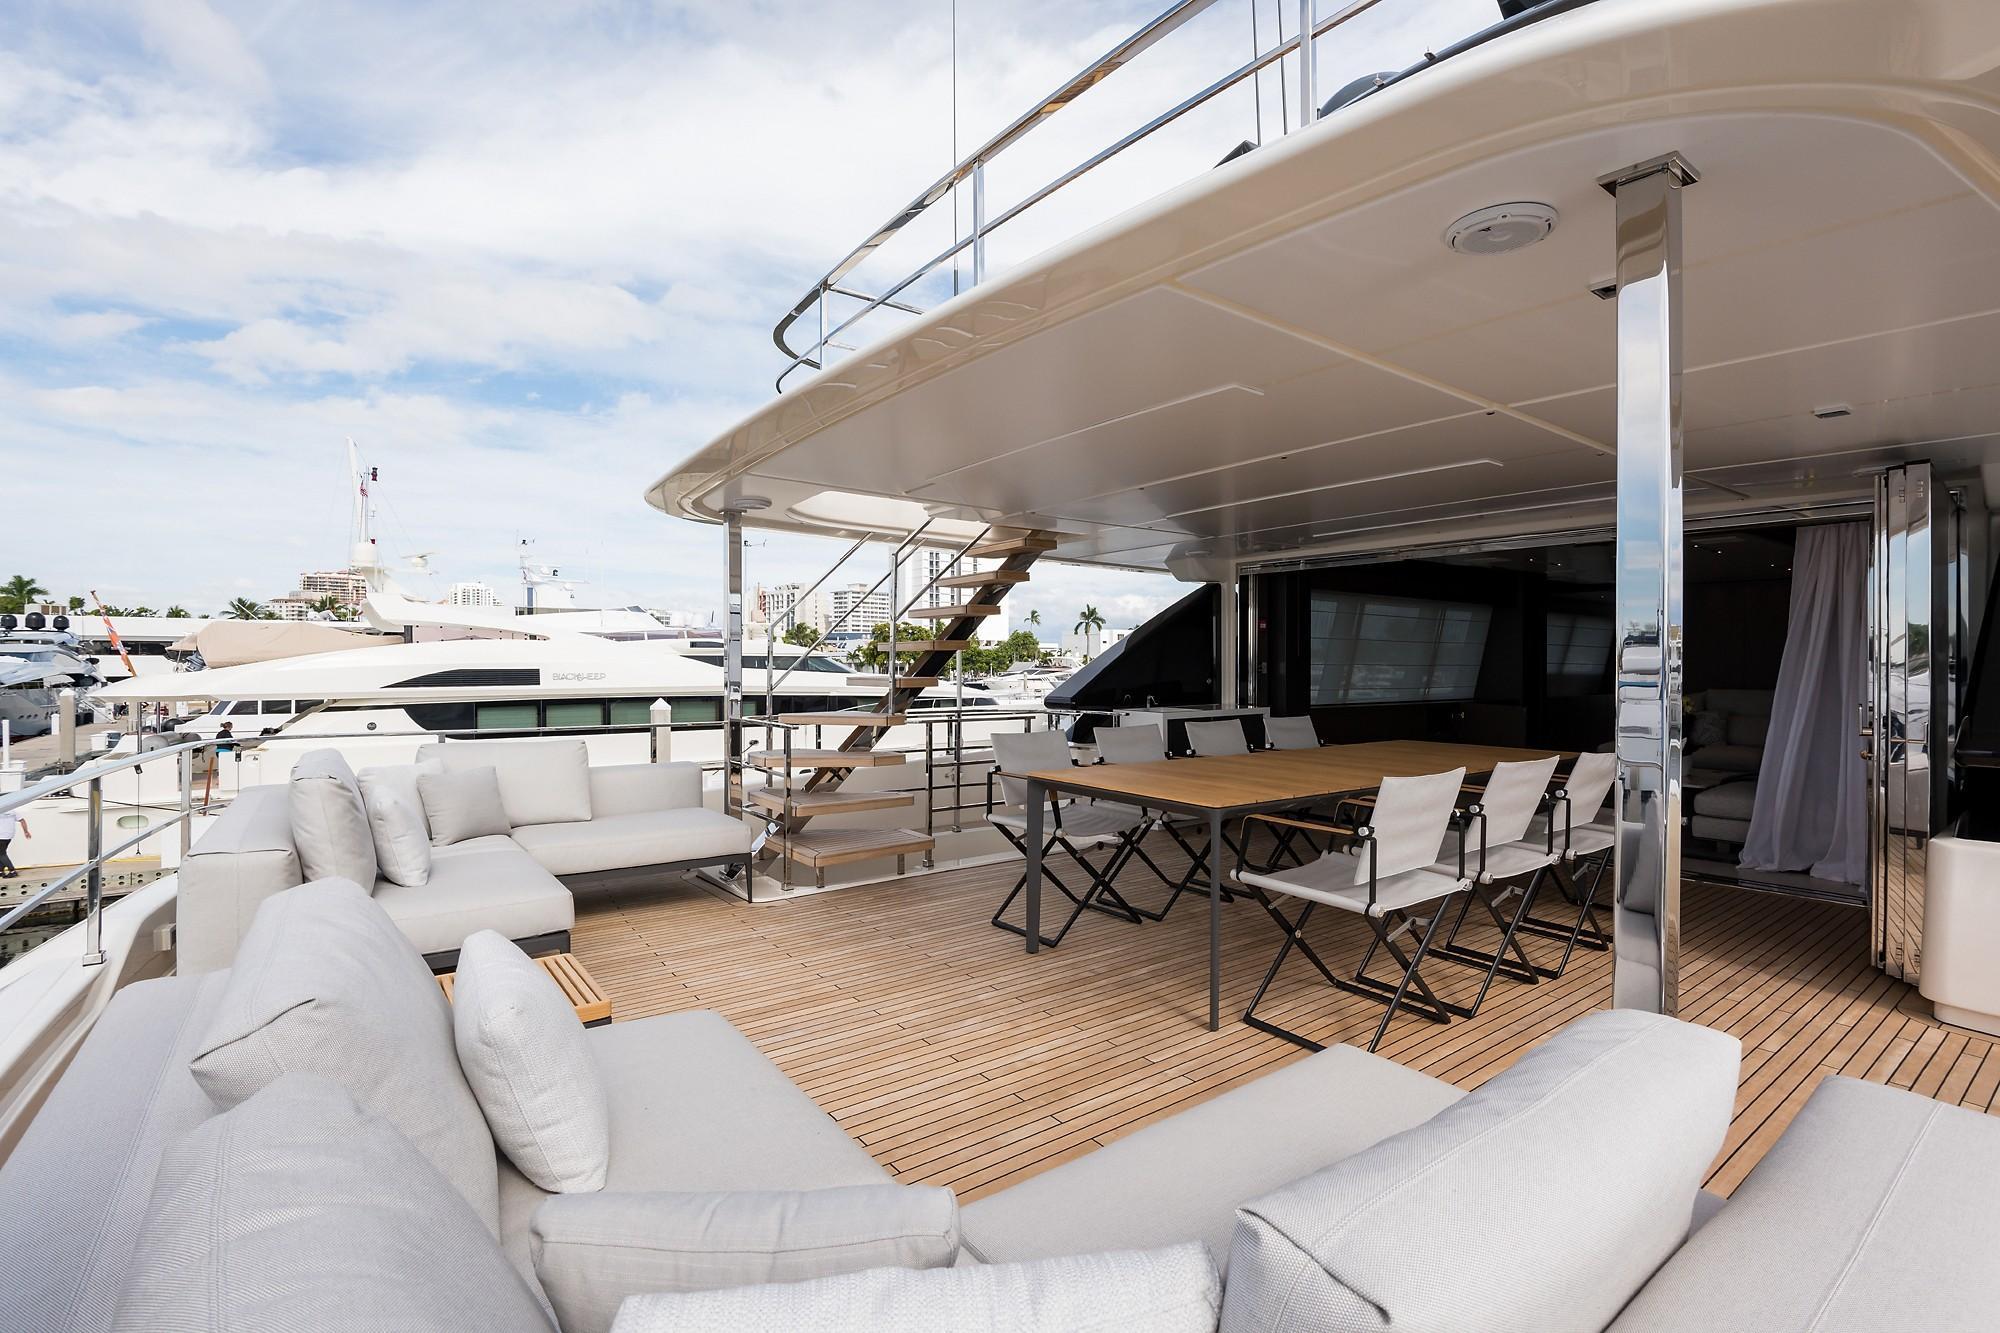 2018 Custom Line Navetta 33 M - Upper Aft Deck